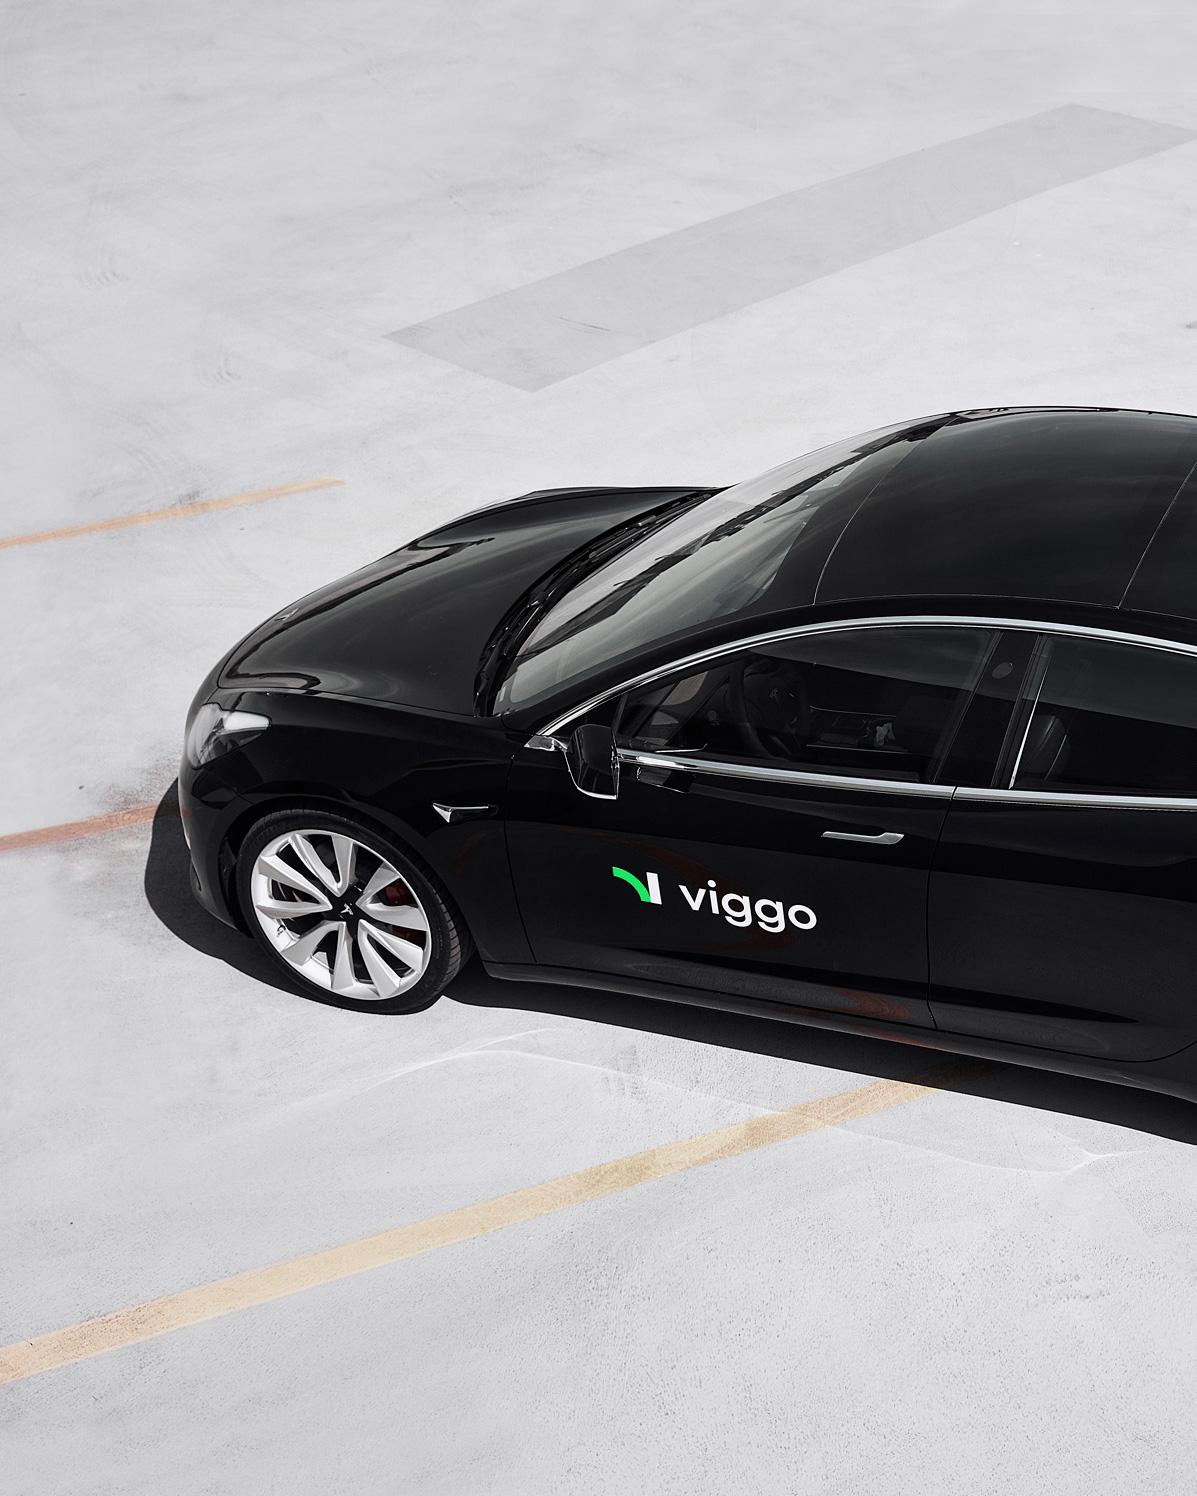 Viggo-Car01-1080x1350px